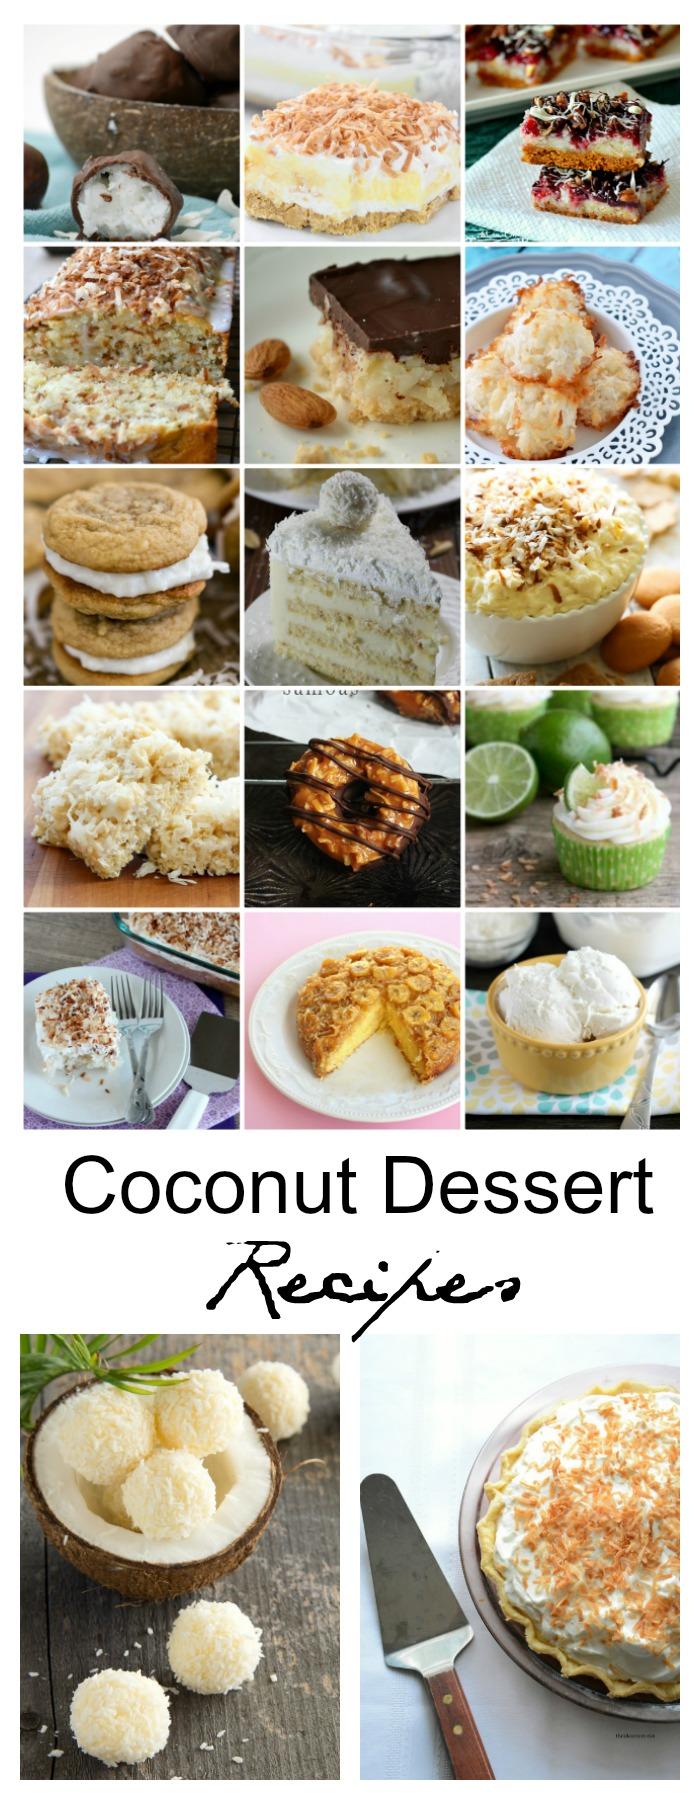 Coconut-Dessert-Recipes-Pin